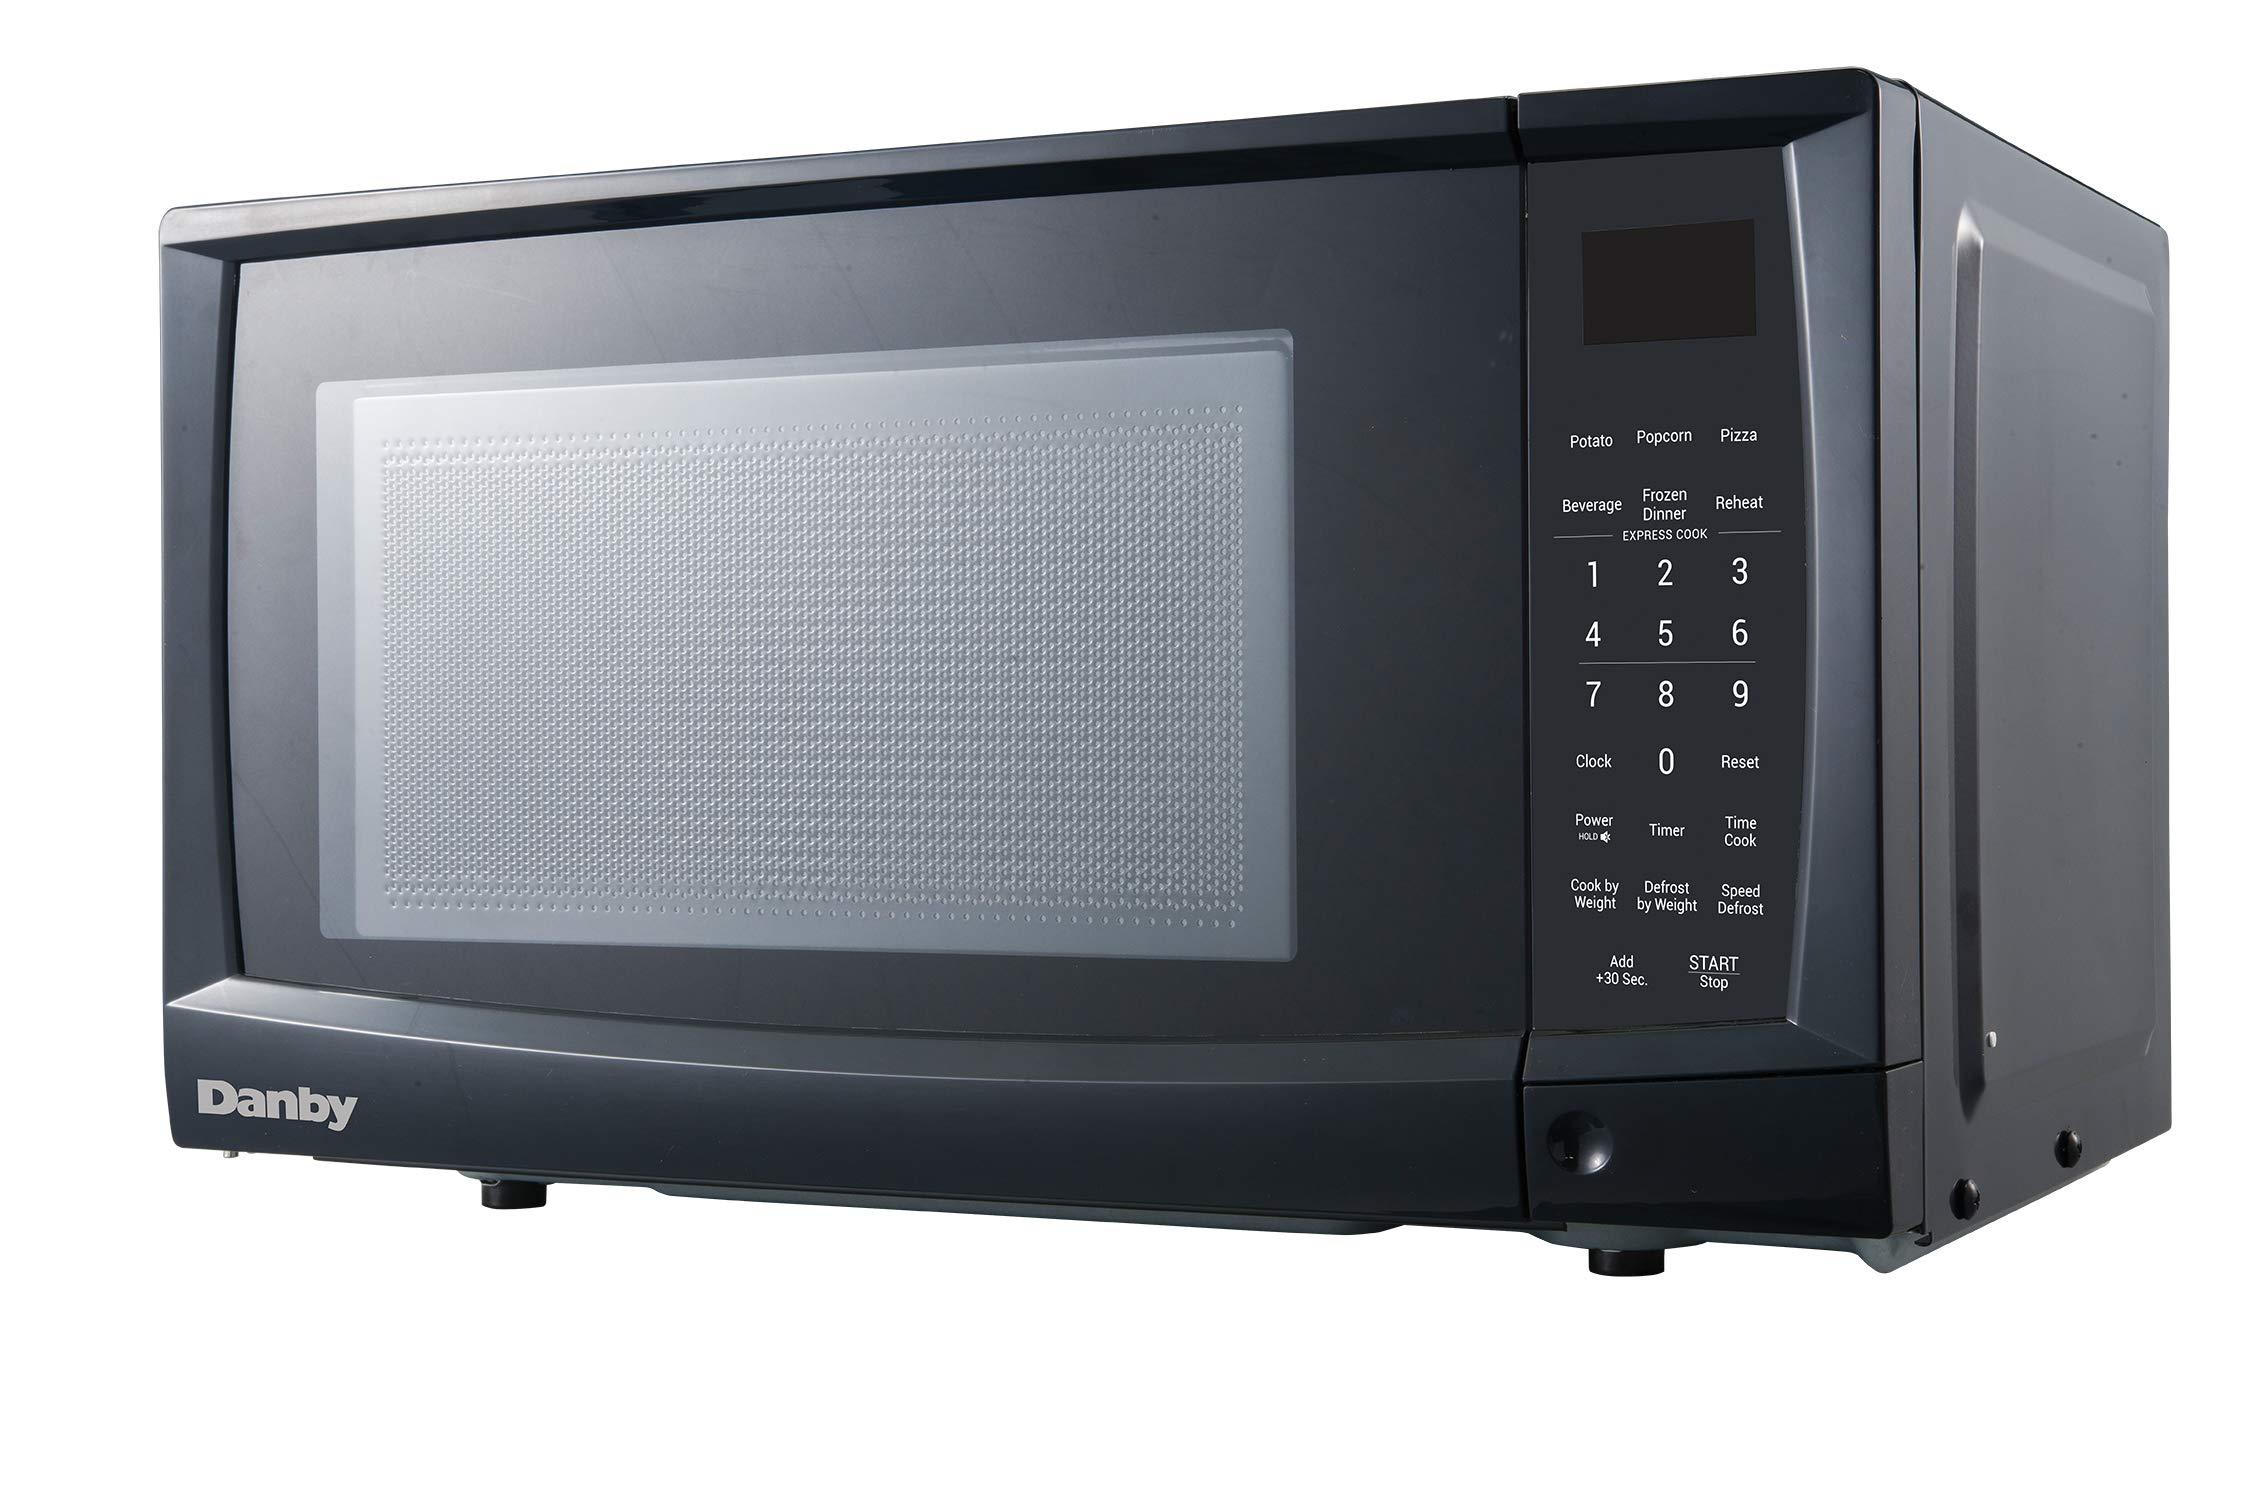 Danby DMW09A2BDB 0.9 cu. ft. Microwave Oven, Black.9 cu.ft,